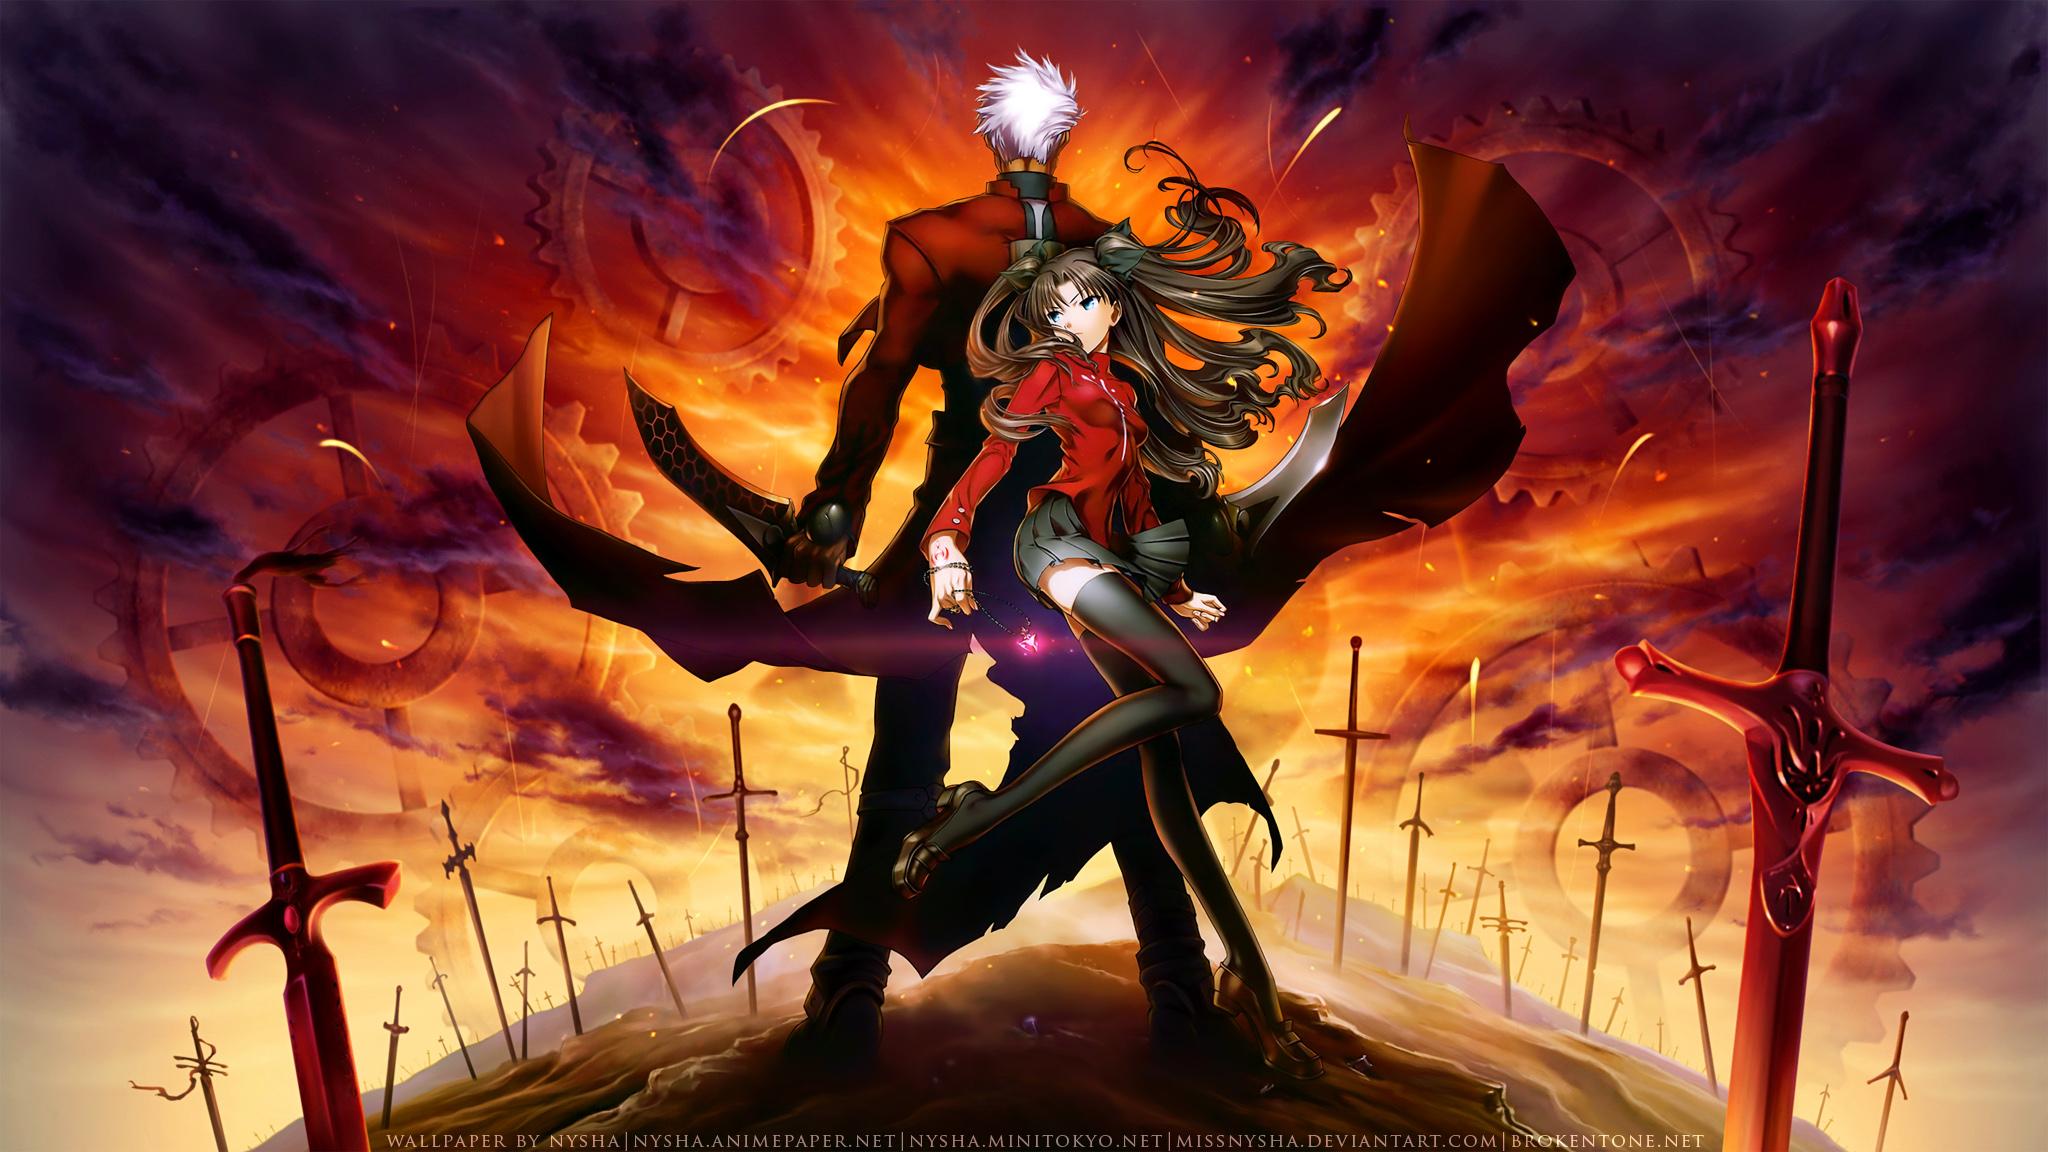 archer fate stay night missnysha tohsaka rin unlimited blade works 2048x1152